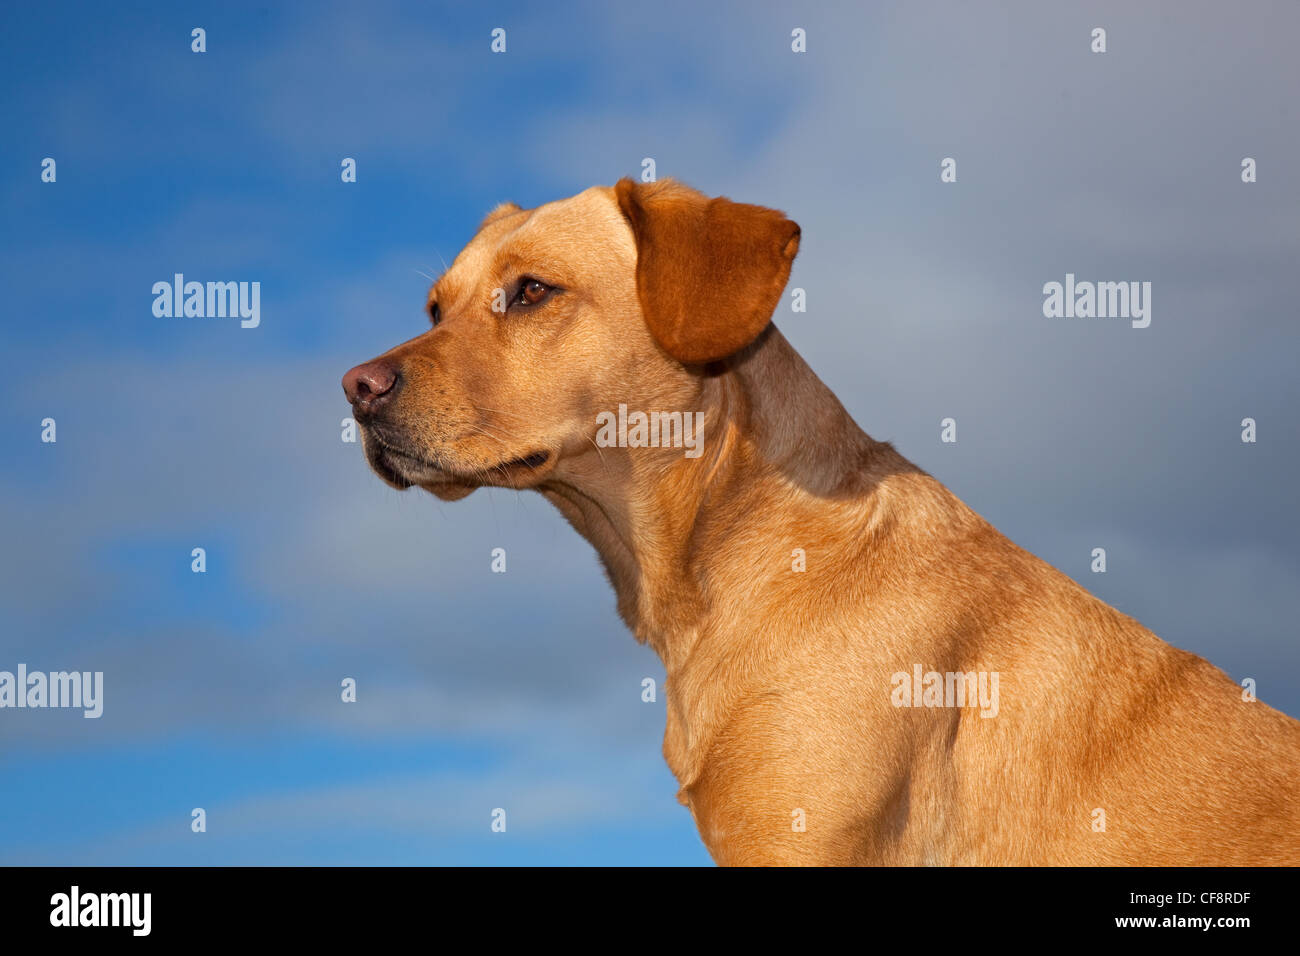 Yellow Labrador portrait - Stock Image